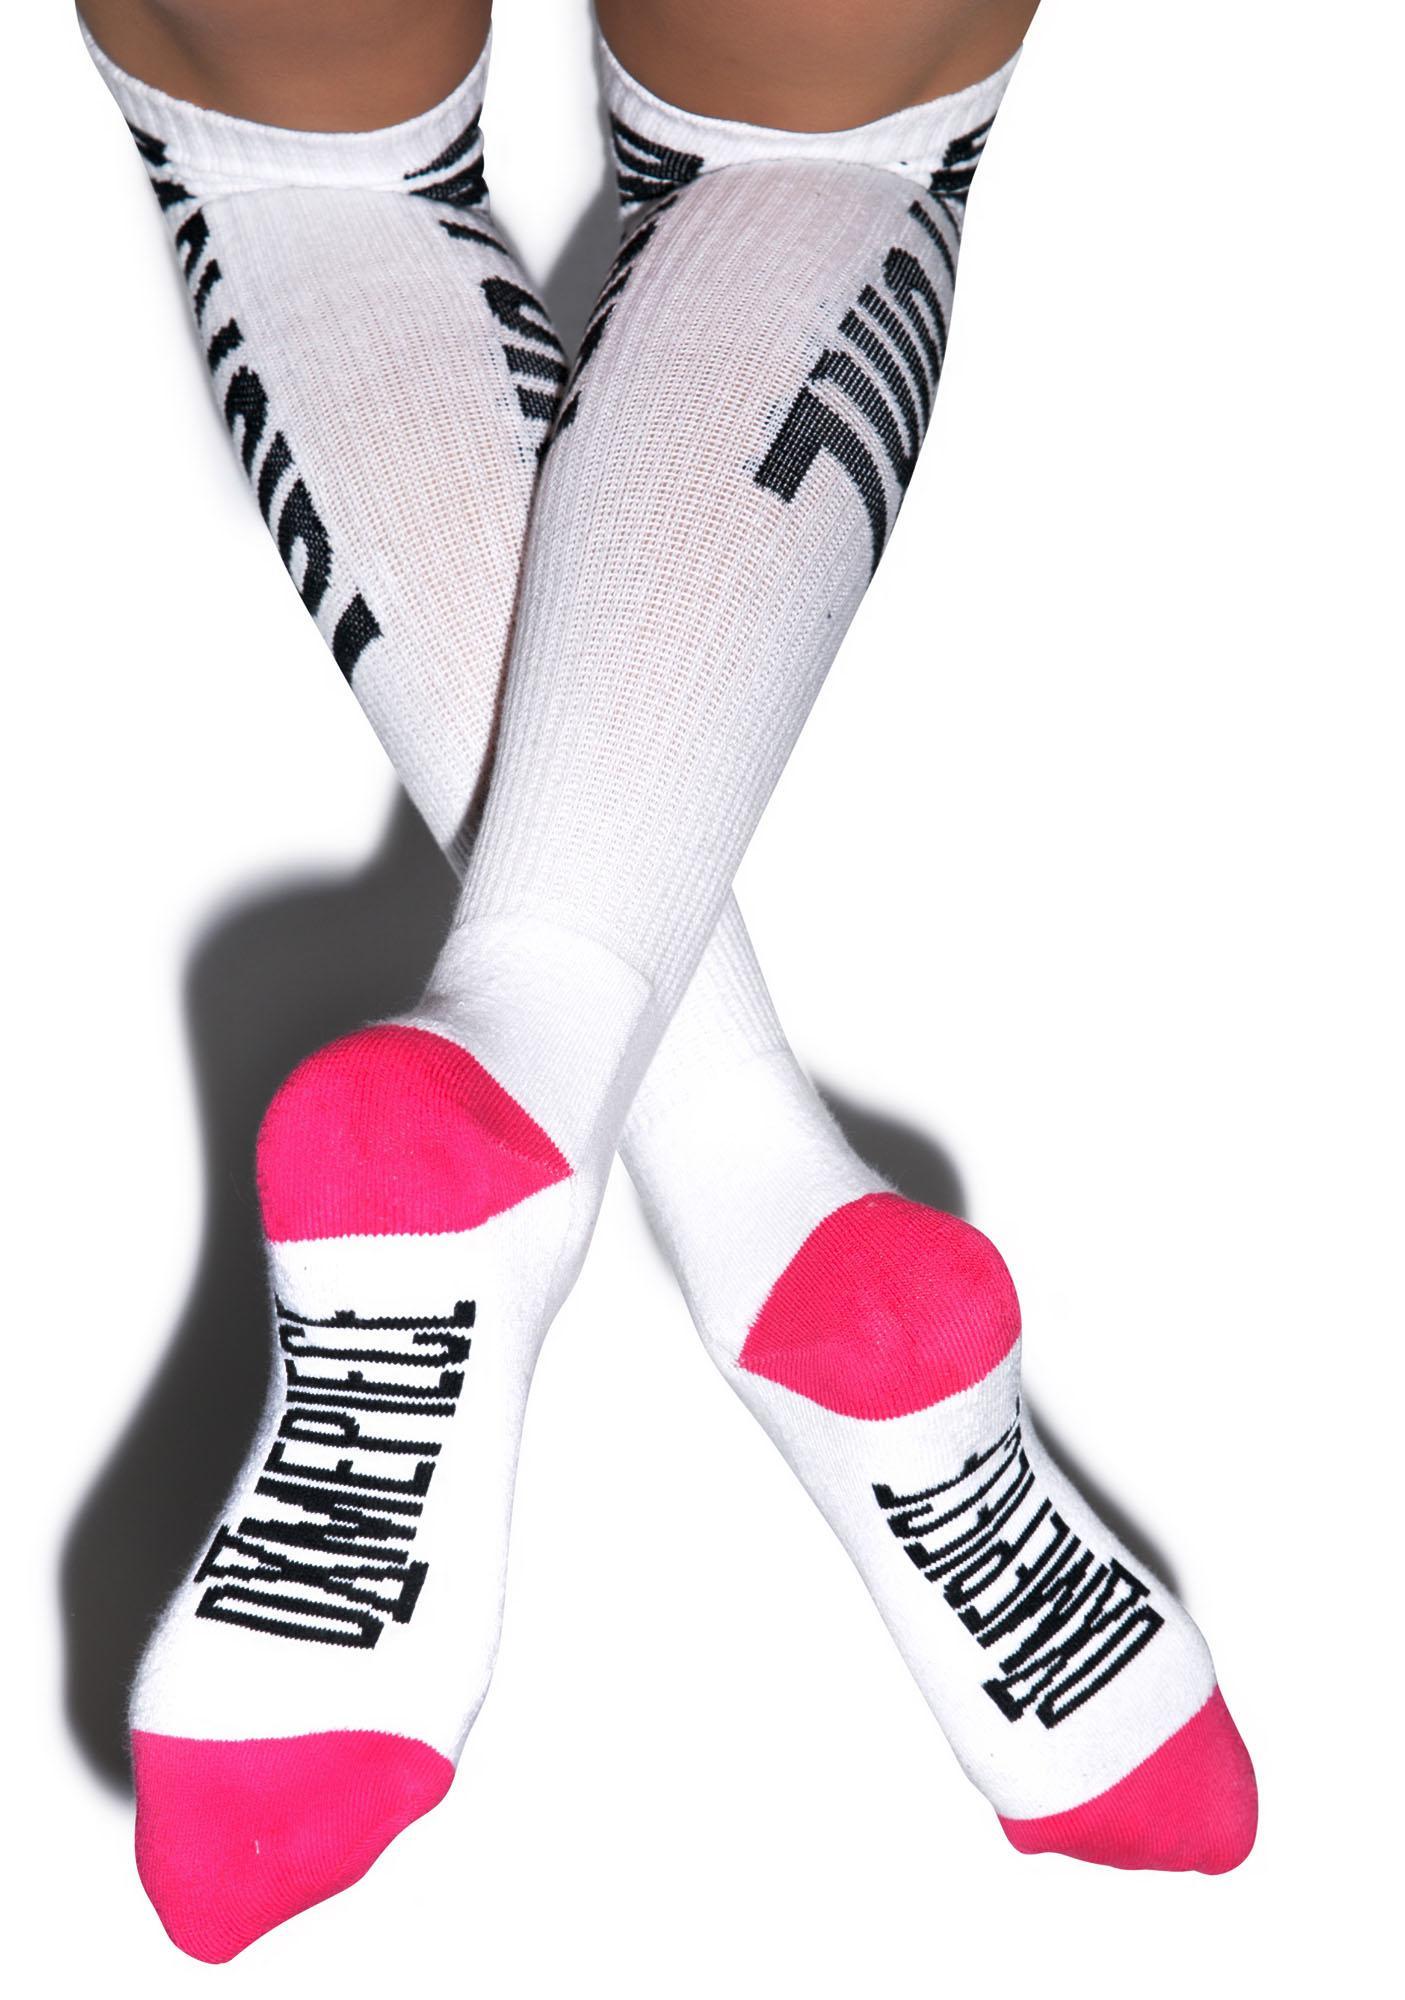 Dimepiece Babygirl Socks